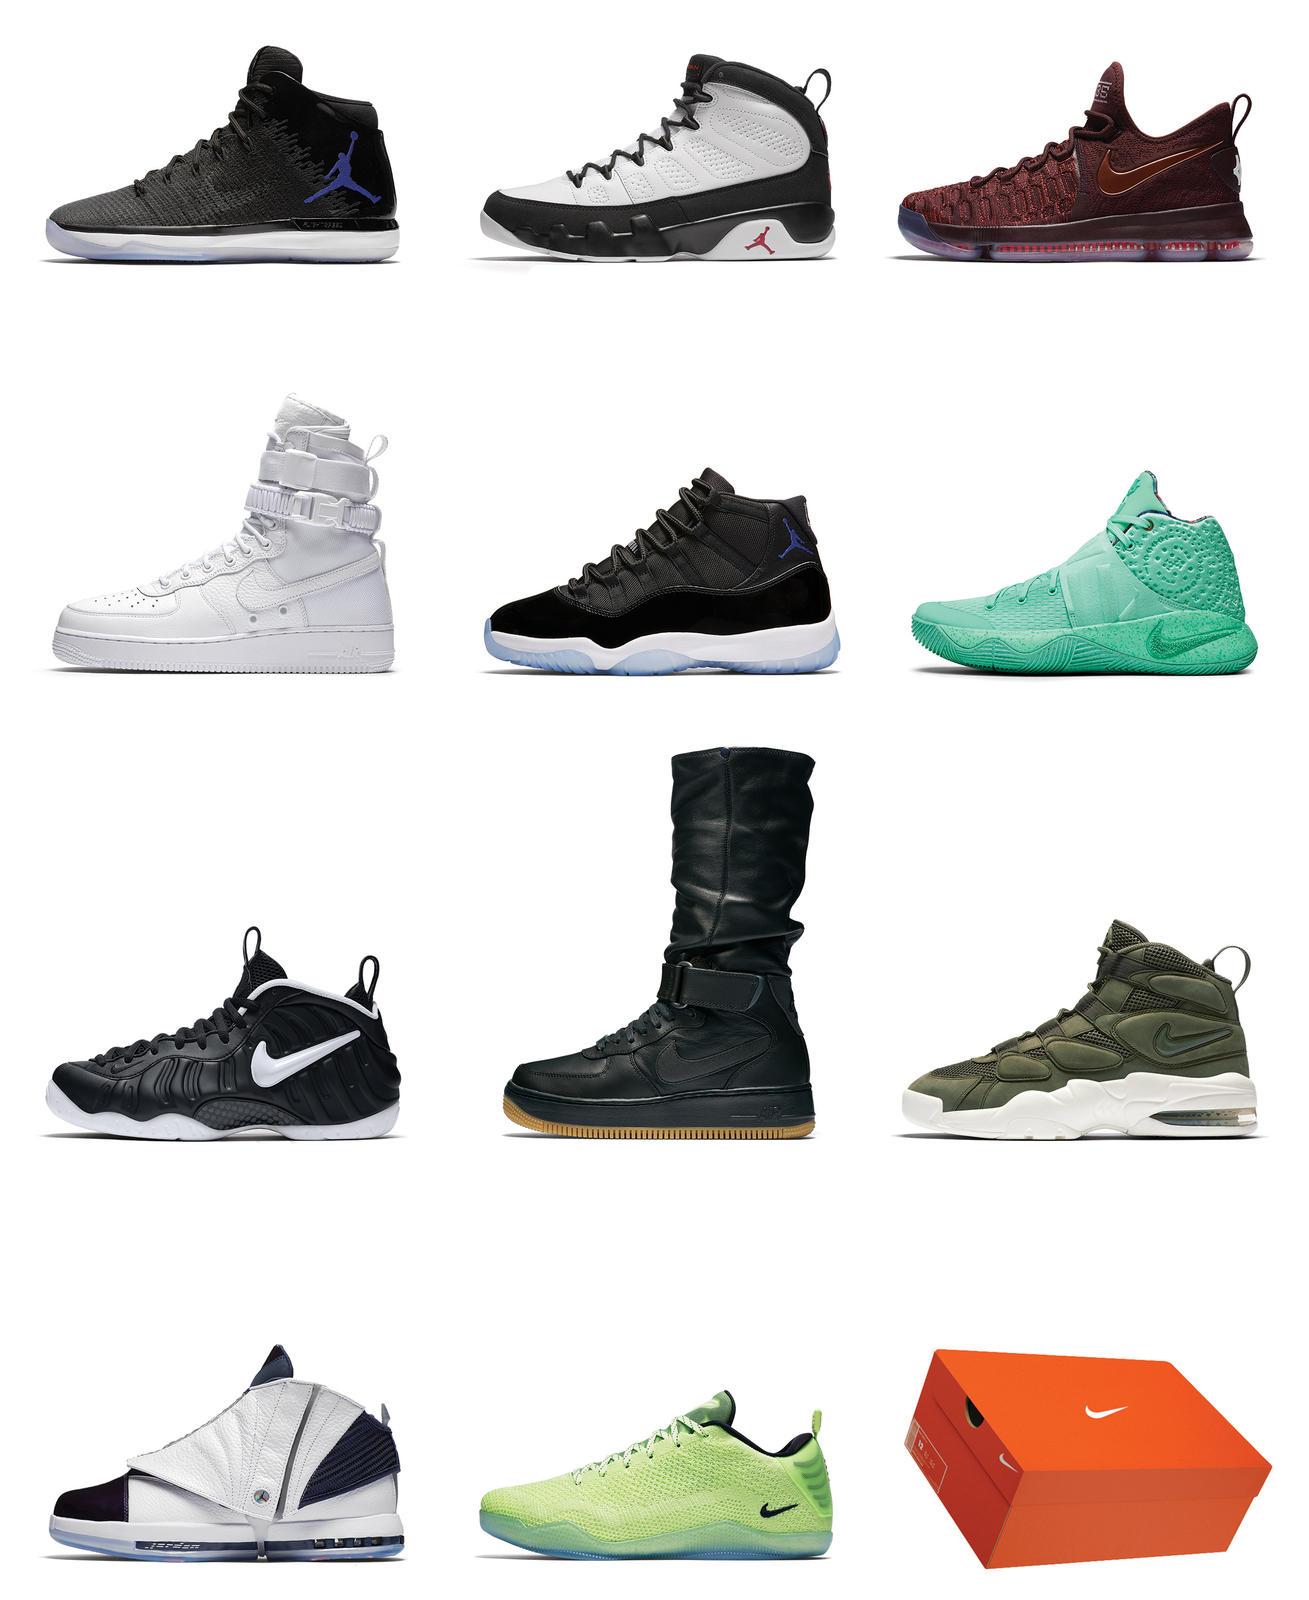 Nike+ SNKRS Presents 12 Soles - Nike News